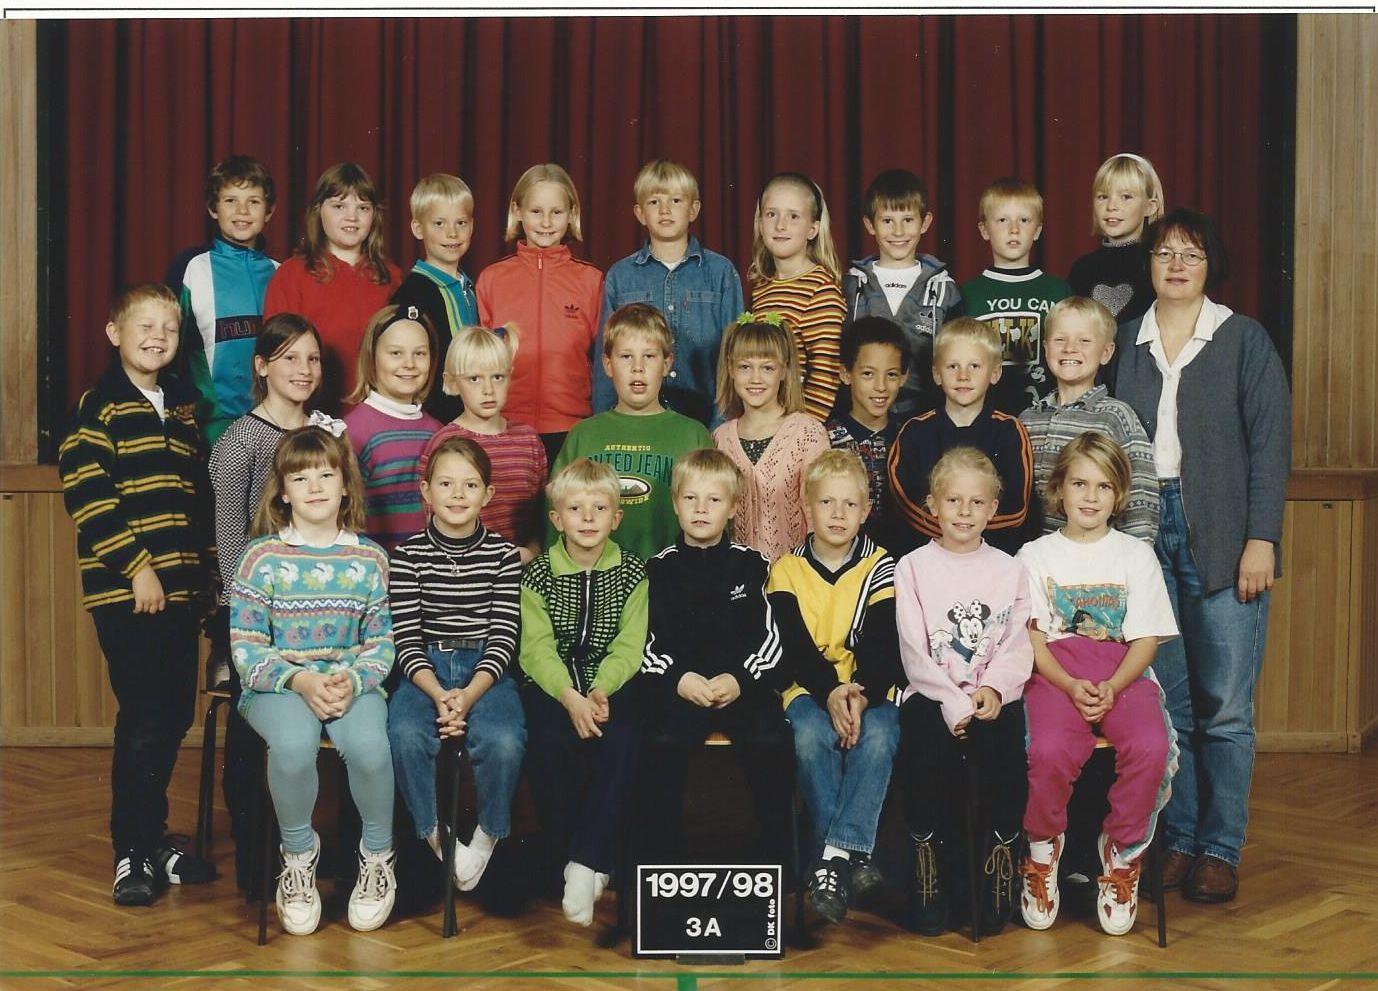 1997-3a